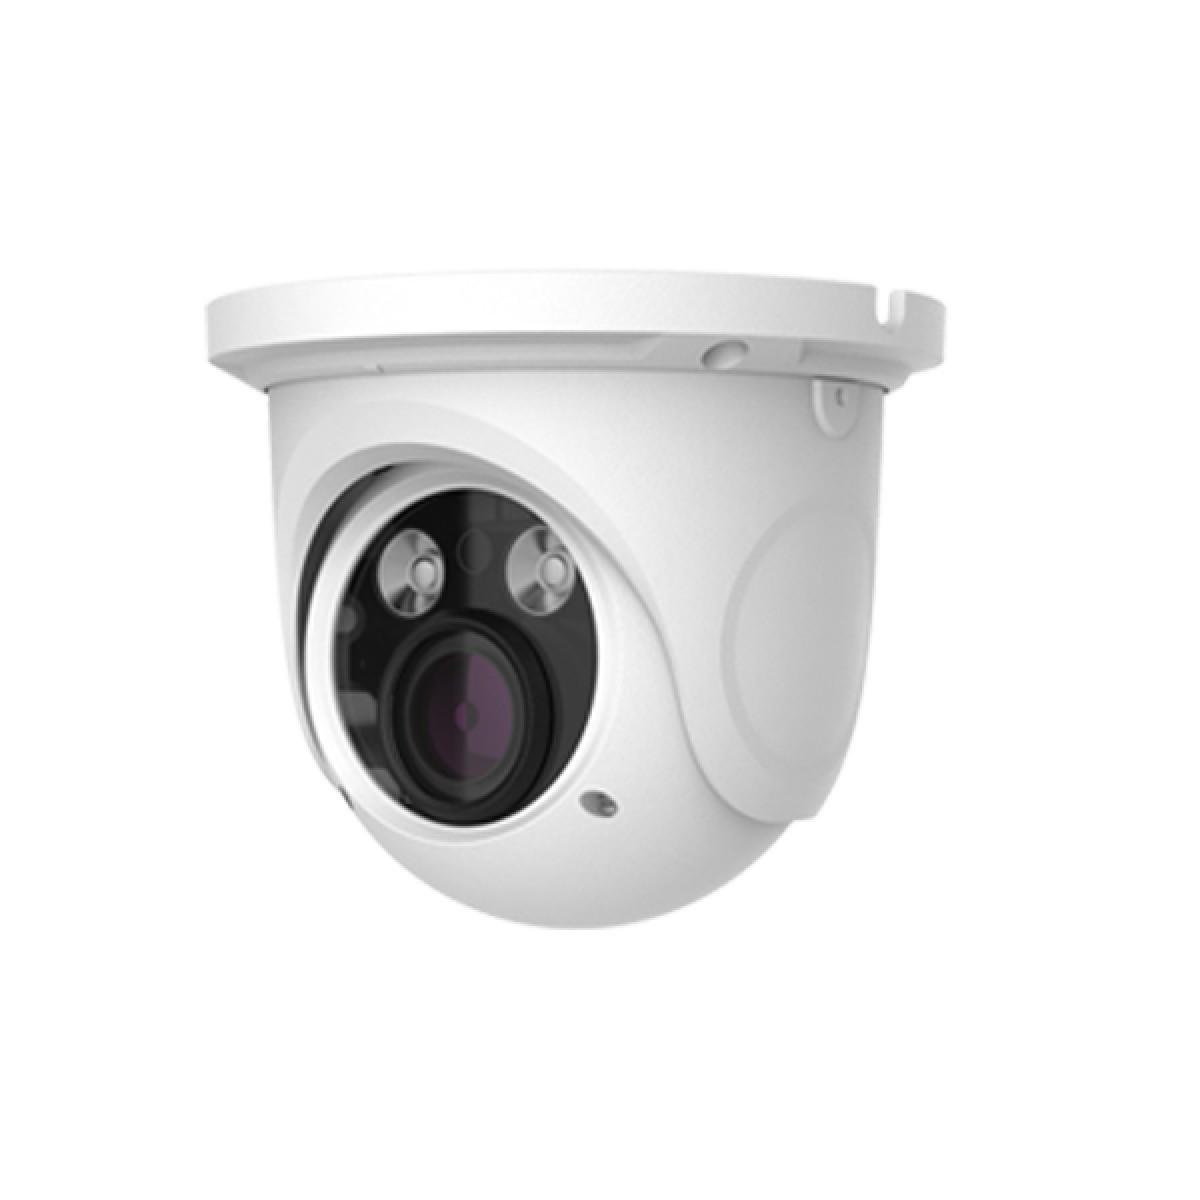 IP Видеокамера TD-9525S1 (D/FZ/PE/AR2)